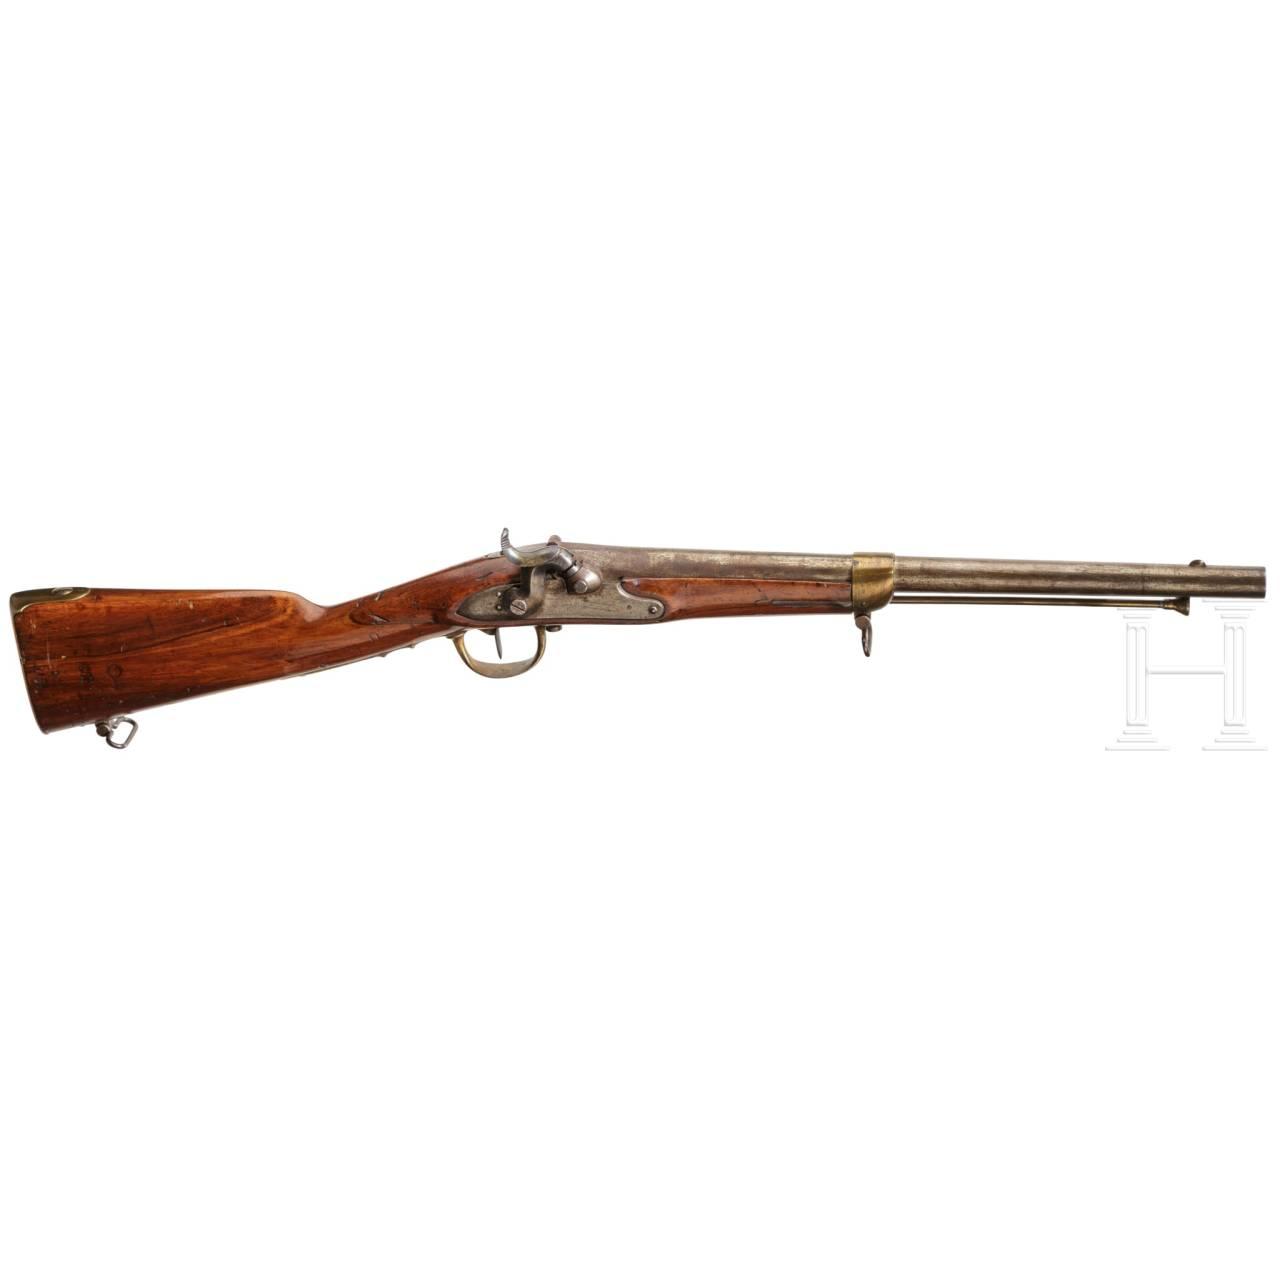 A Baden artillery carbine M 1816/40/50 U/M